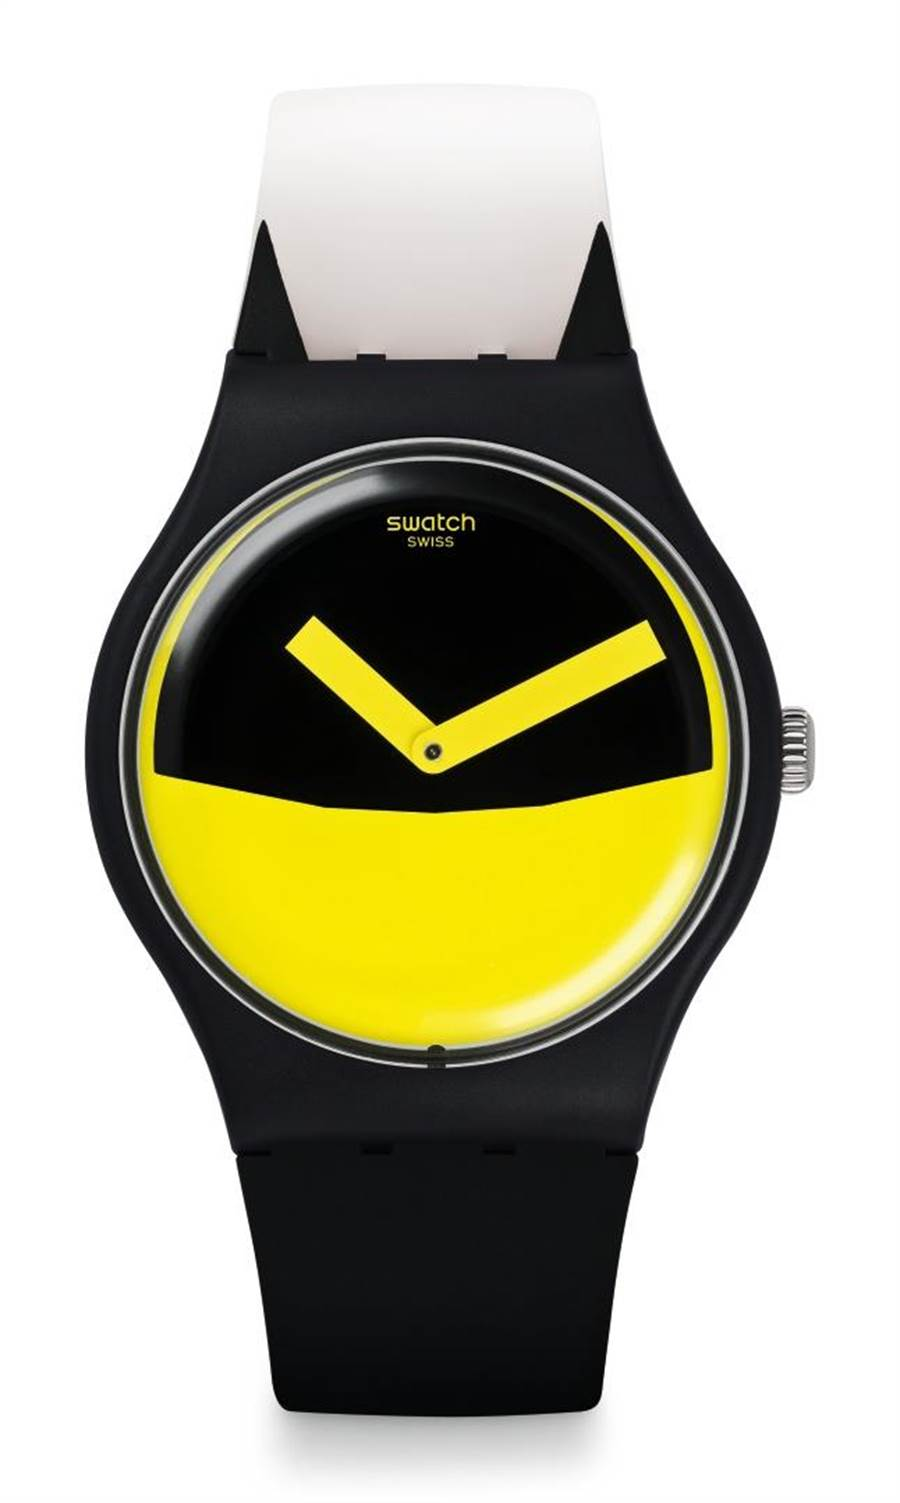 SWATCH萬聖節主打蝙蝠俠黃黑對比色的「正義使者」腕表,2350元。(SWATCH提供)